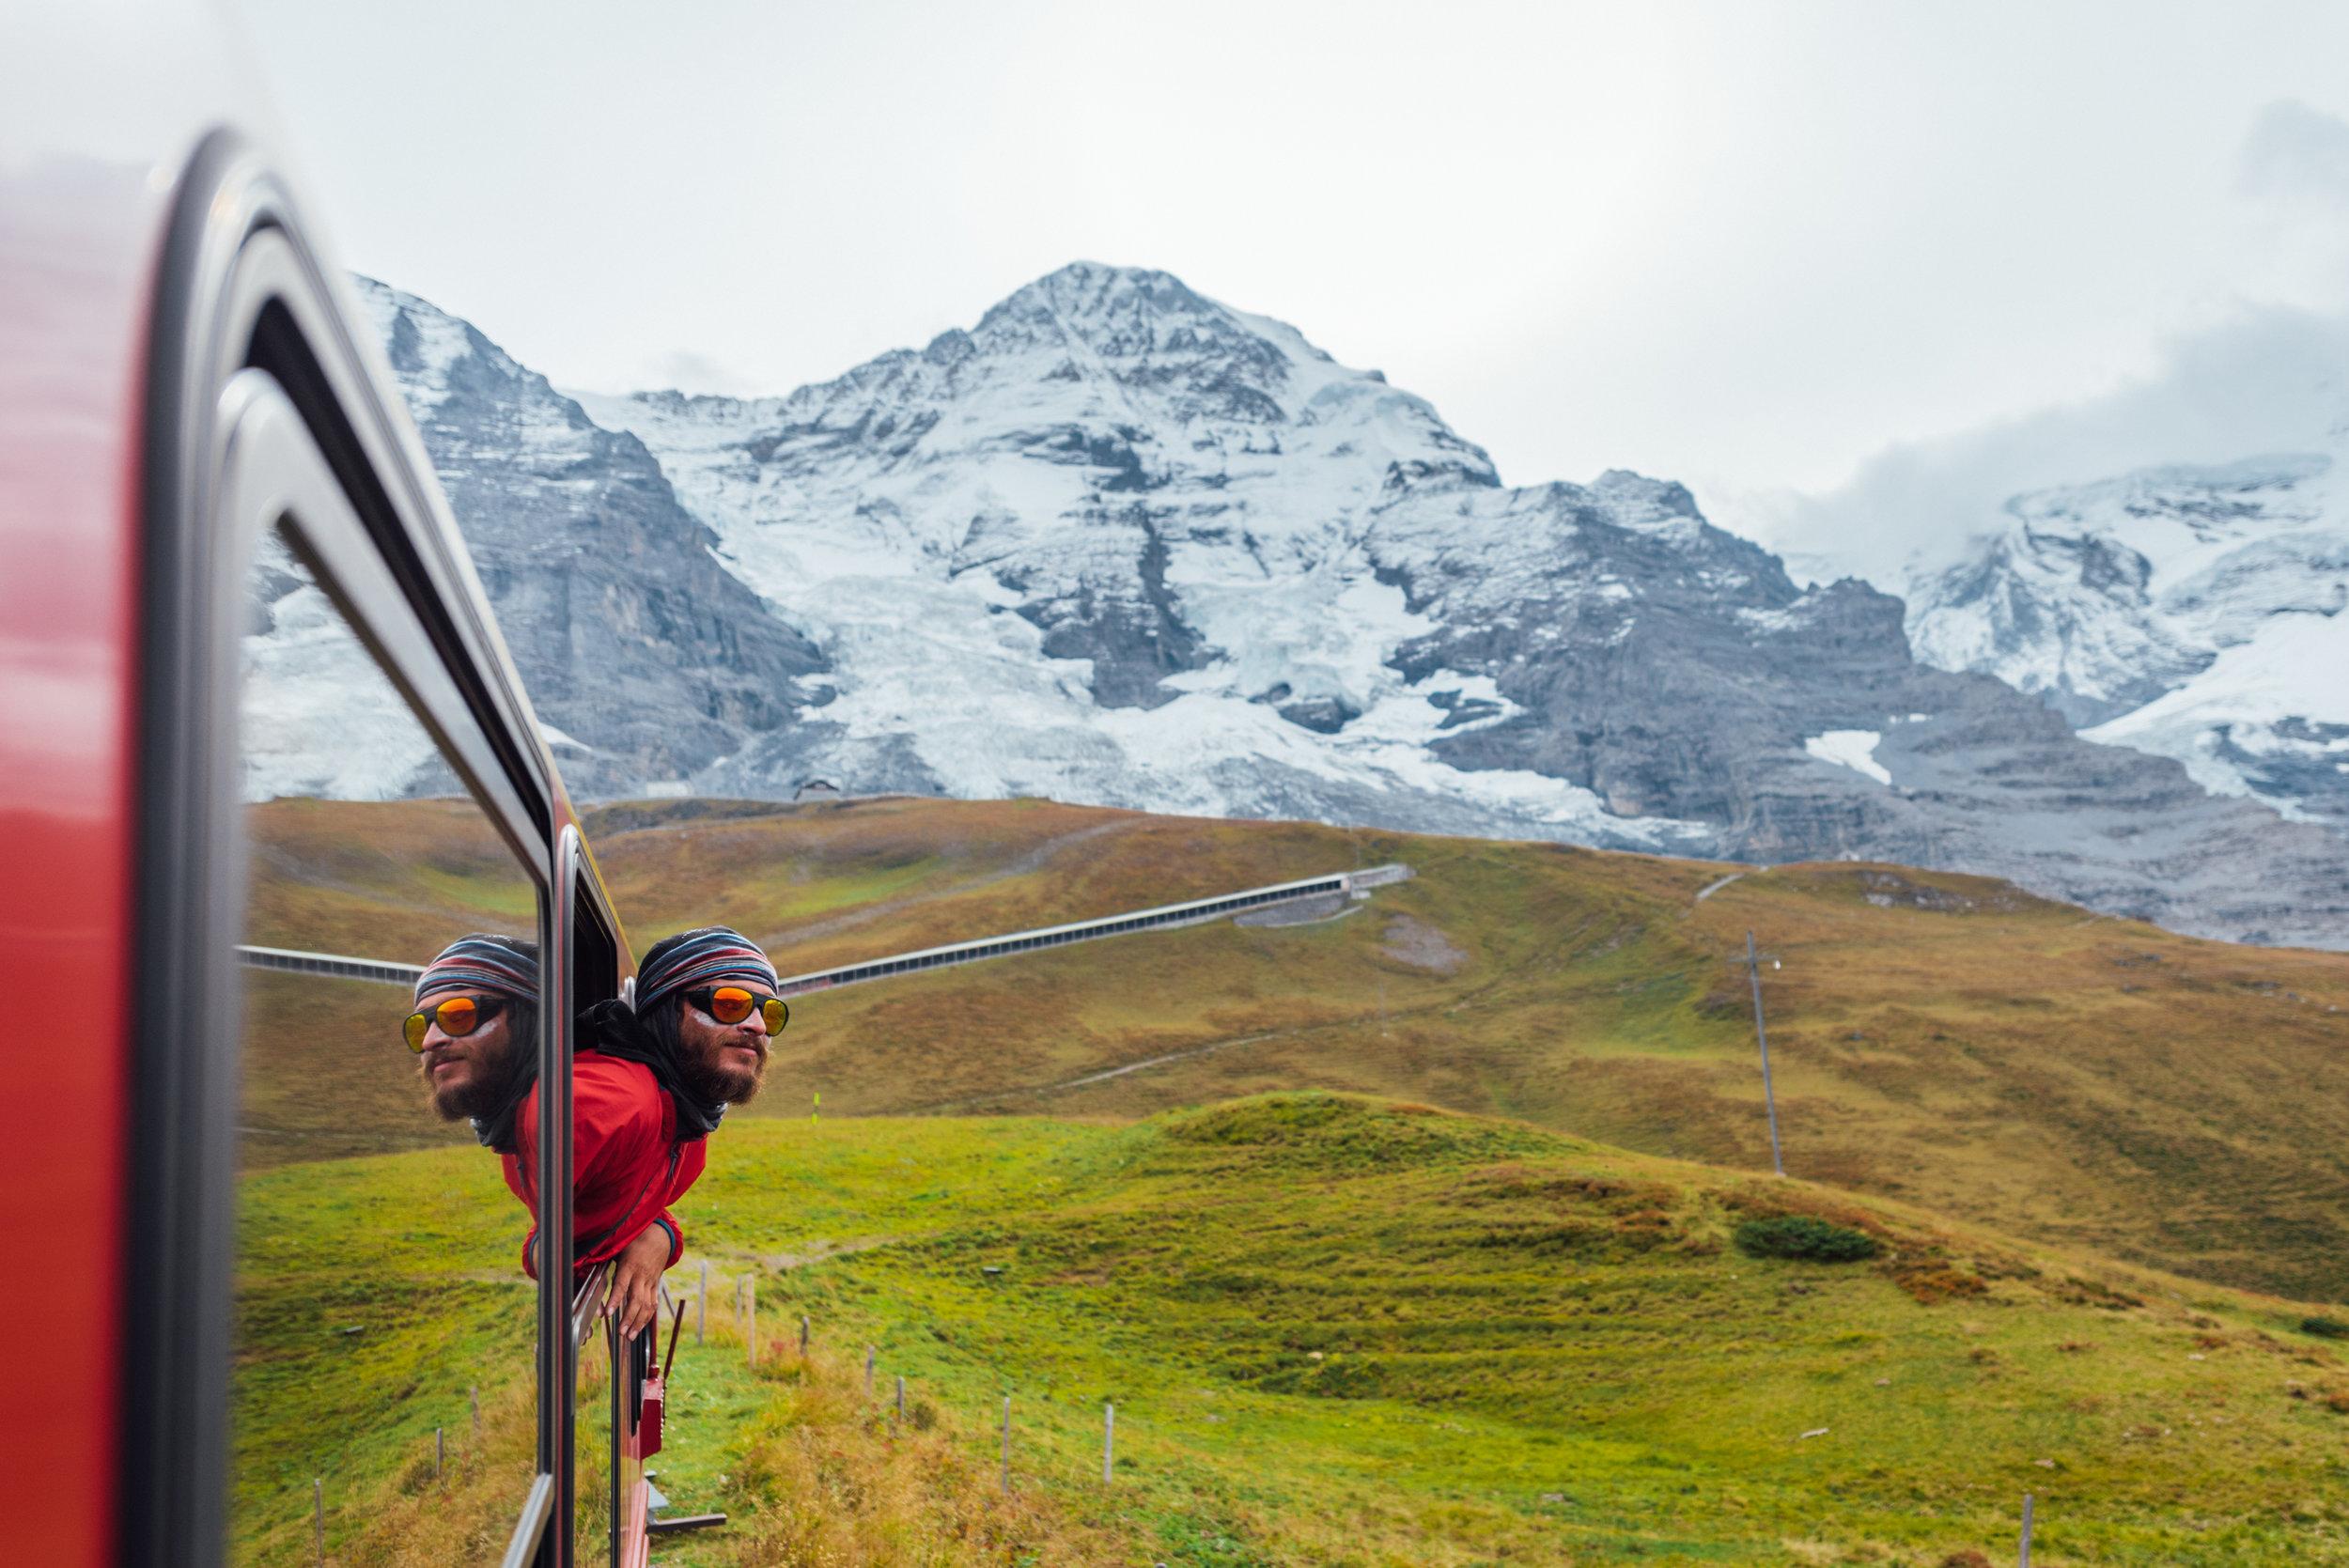 Alps-Fall2016-D750-31.jpg